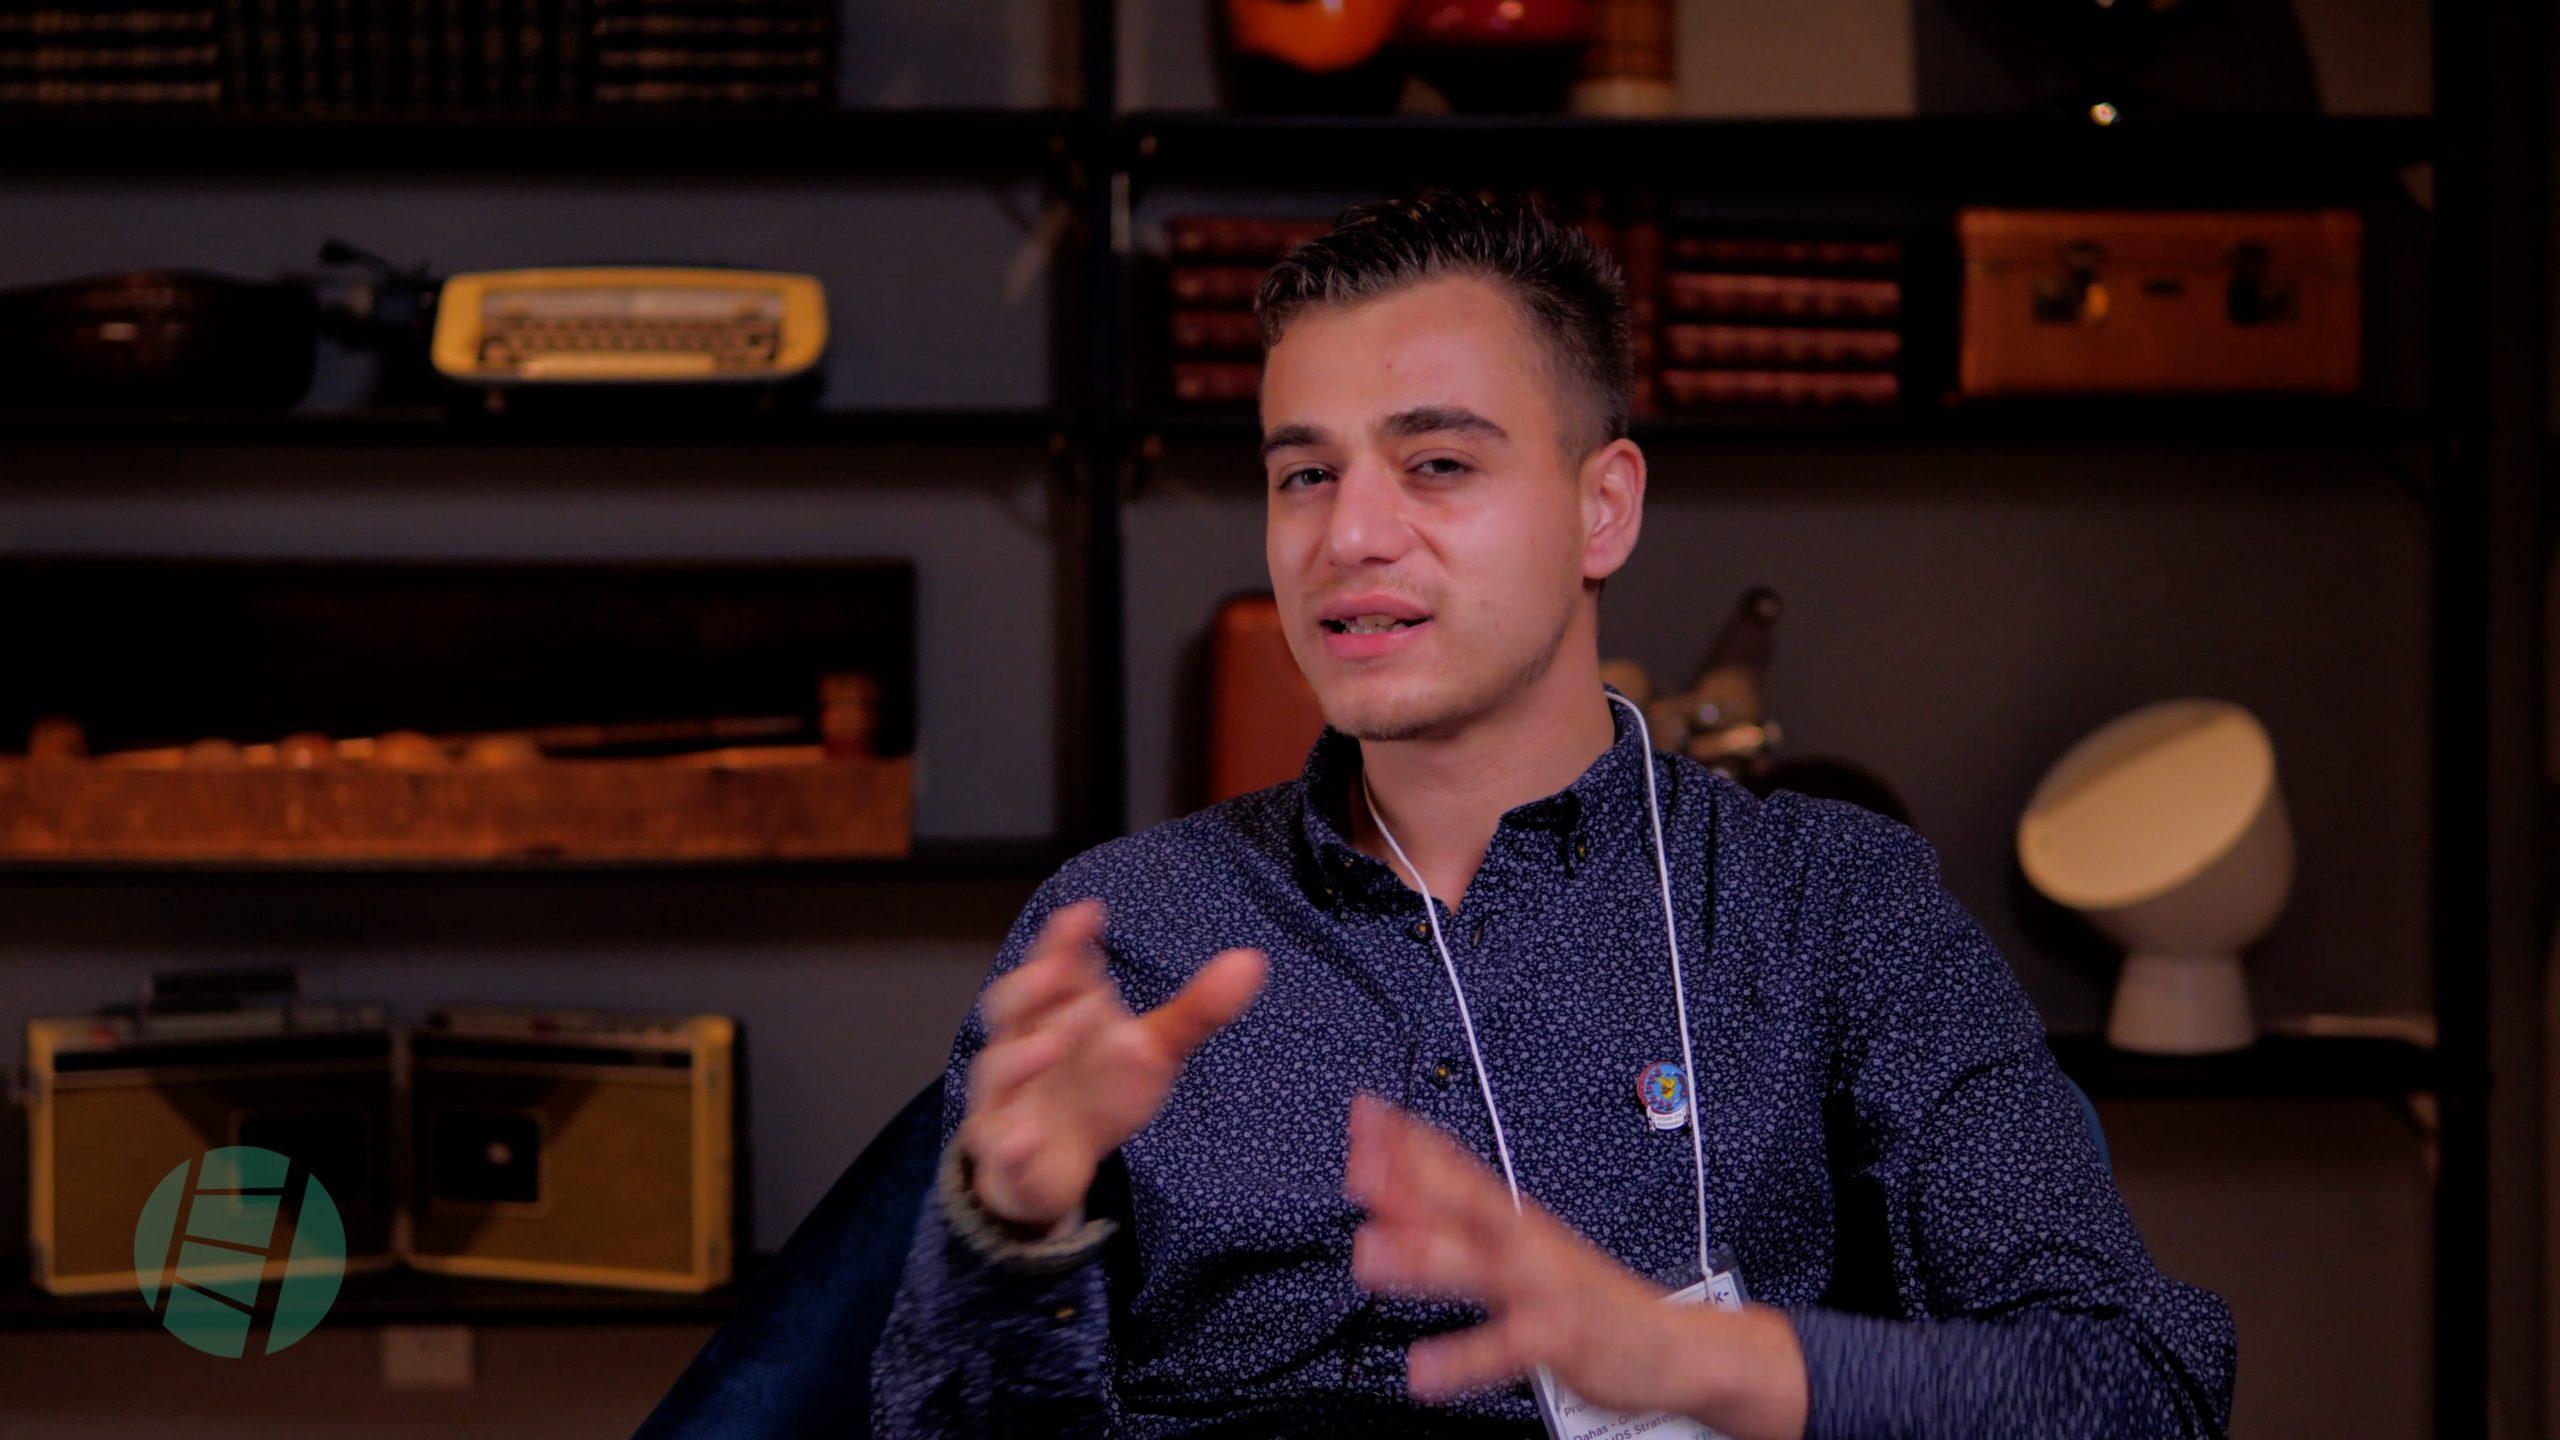 Garrett in a video interview